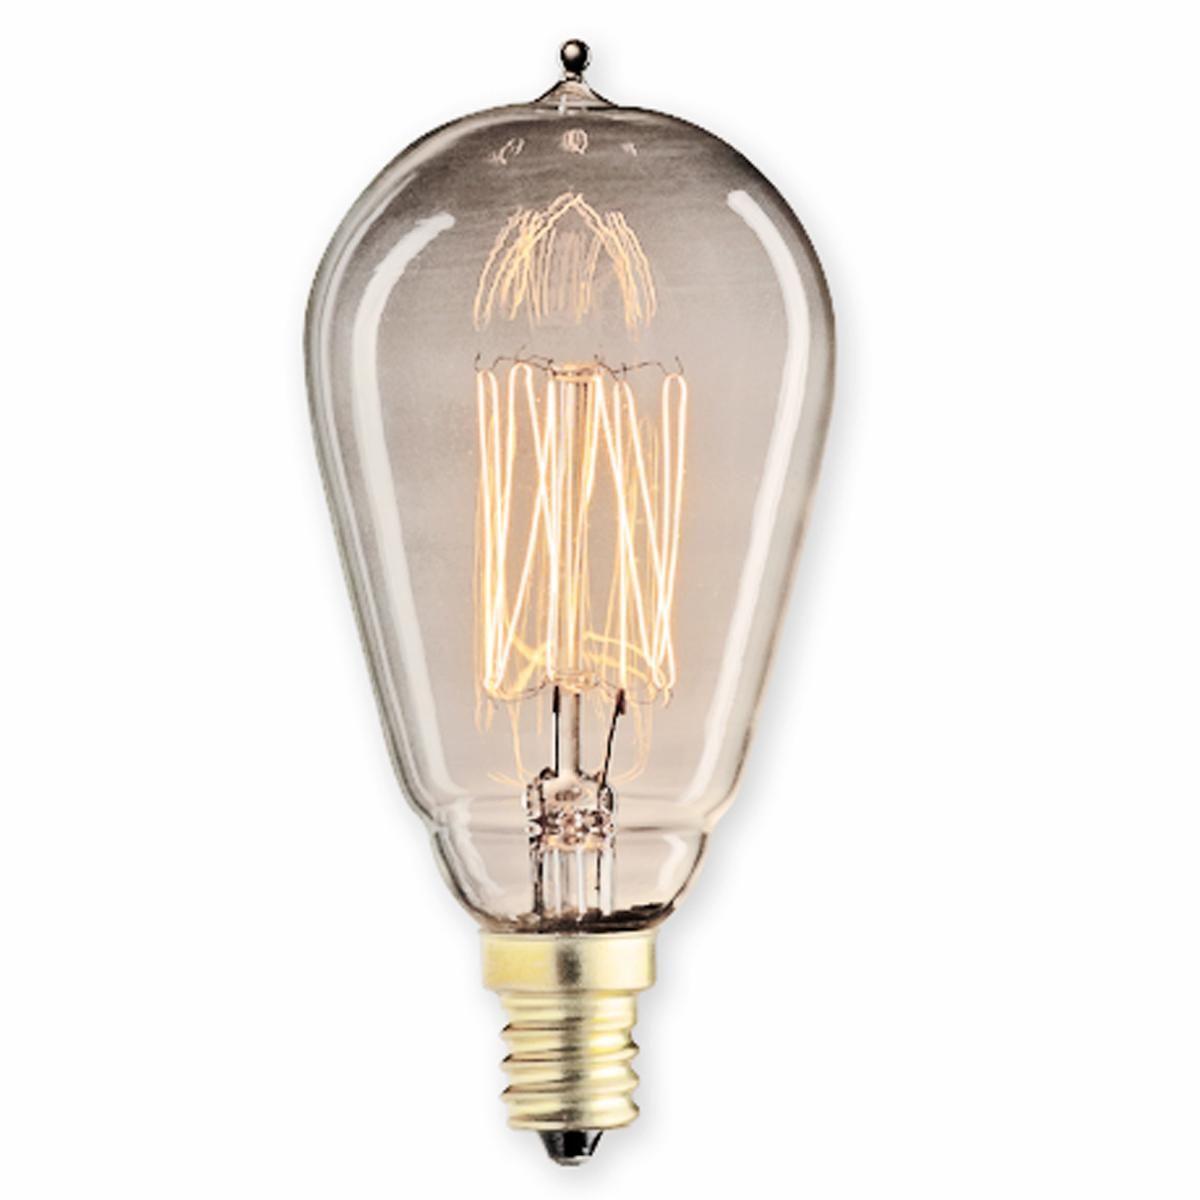 25 Watt Vintage Edison Bulb Candle Base Thread Vintage Edison Bulbs Candle Base Antique Light Bulbs